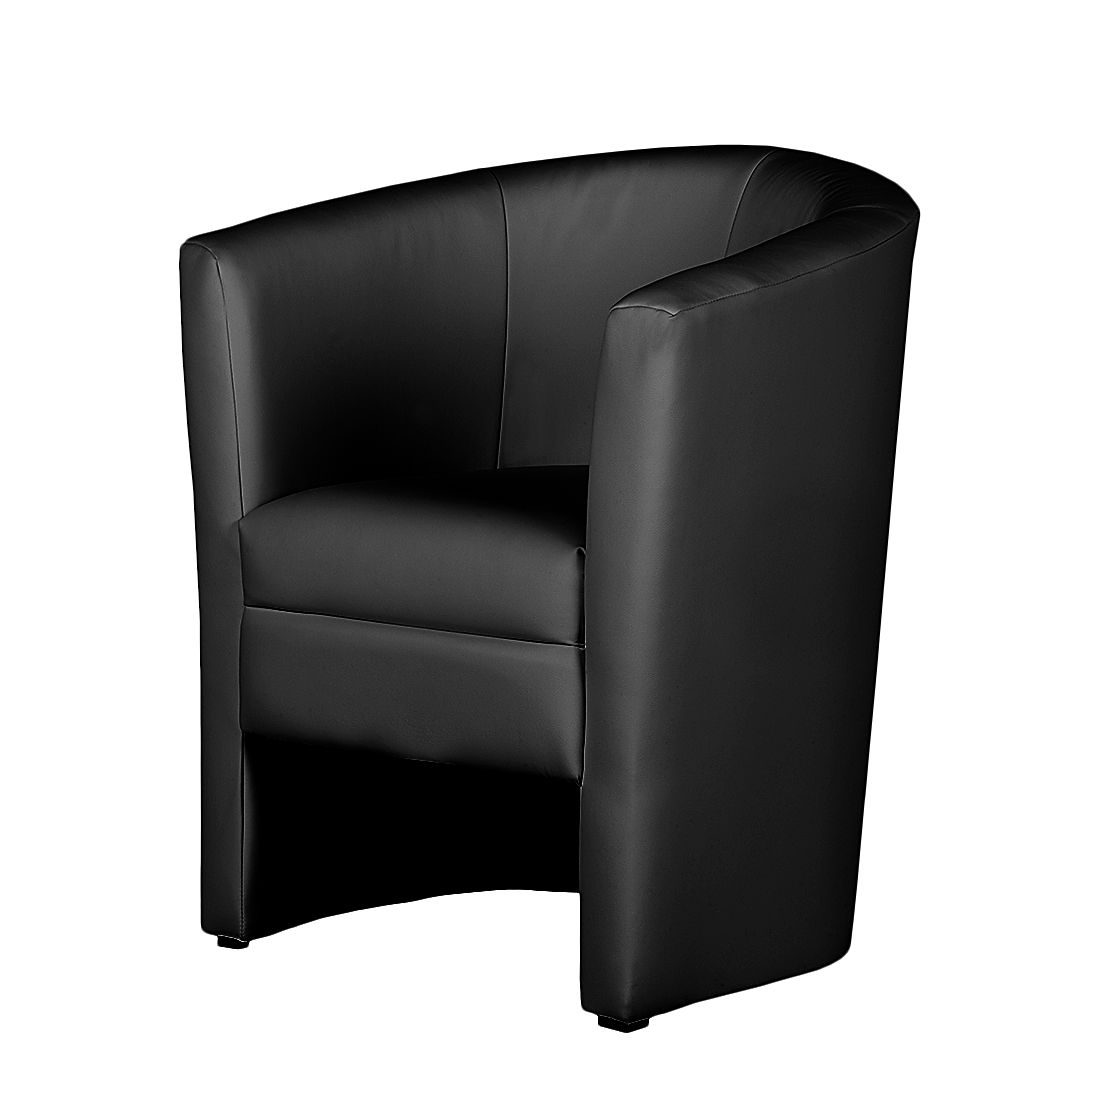 Home 24 - Fauteuil sinclair iii - cuir synthétique noir, mooved